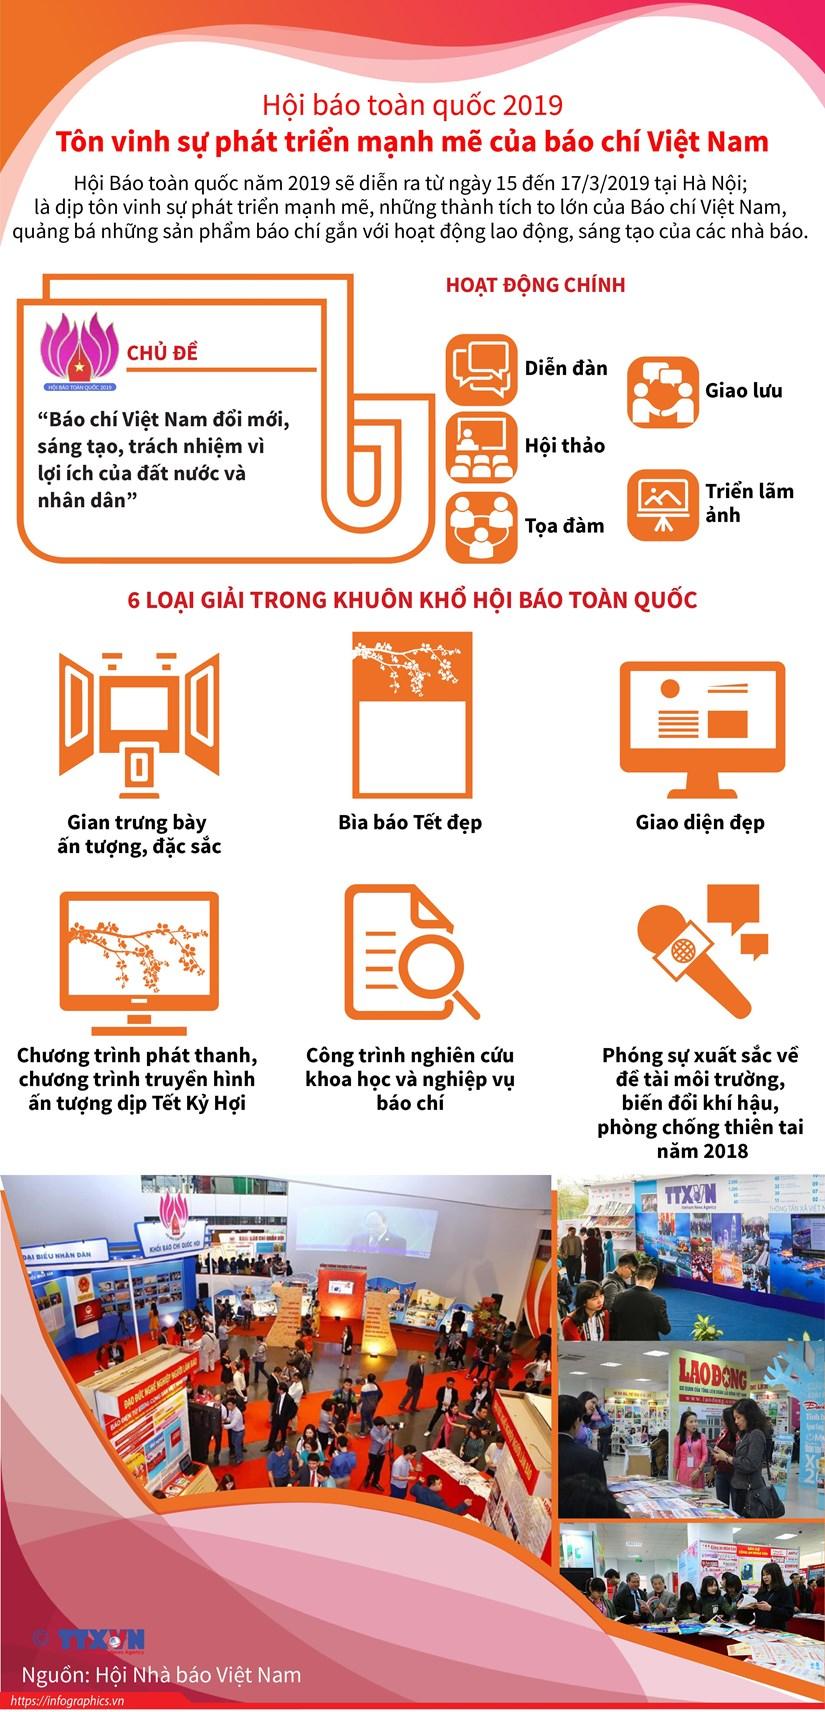 [Infographics] Hoi Bao toan quoc 2019 se dien ra tu 15 den 17/3 hinh anh 1